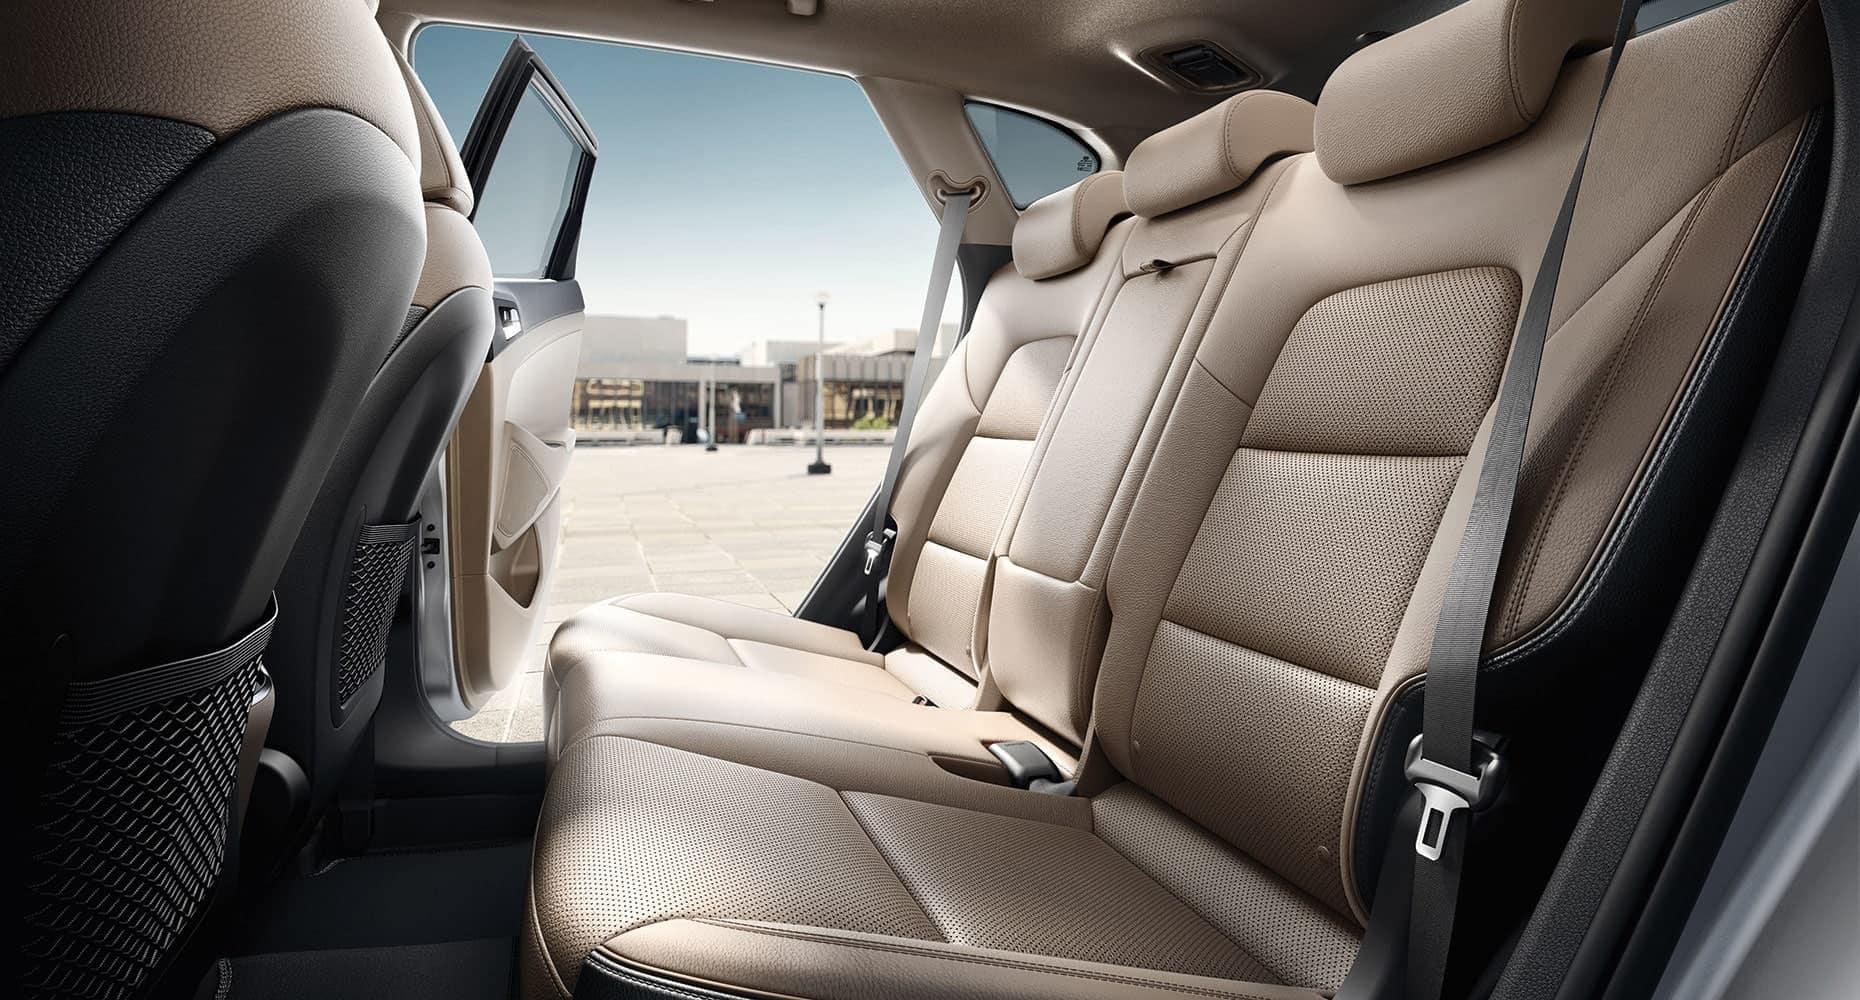 2019 Hyundai Tucson rear interior